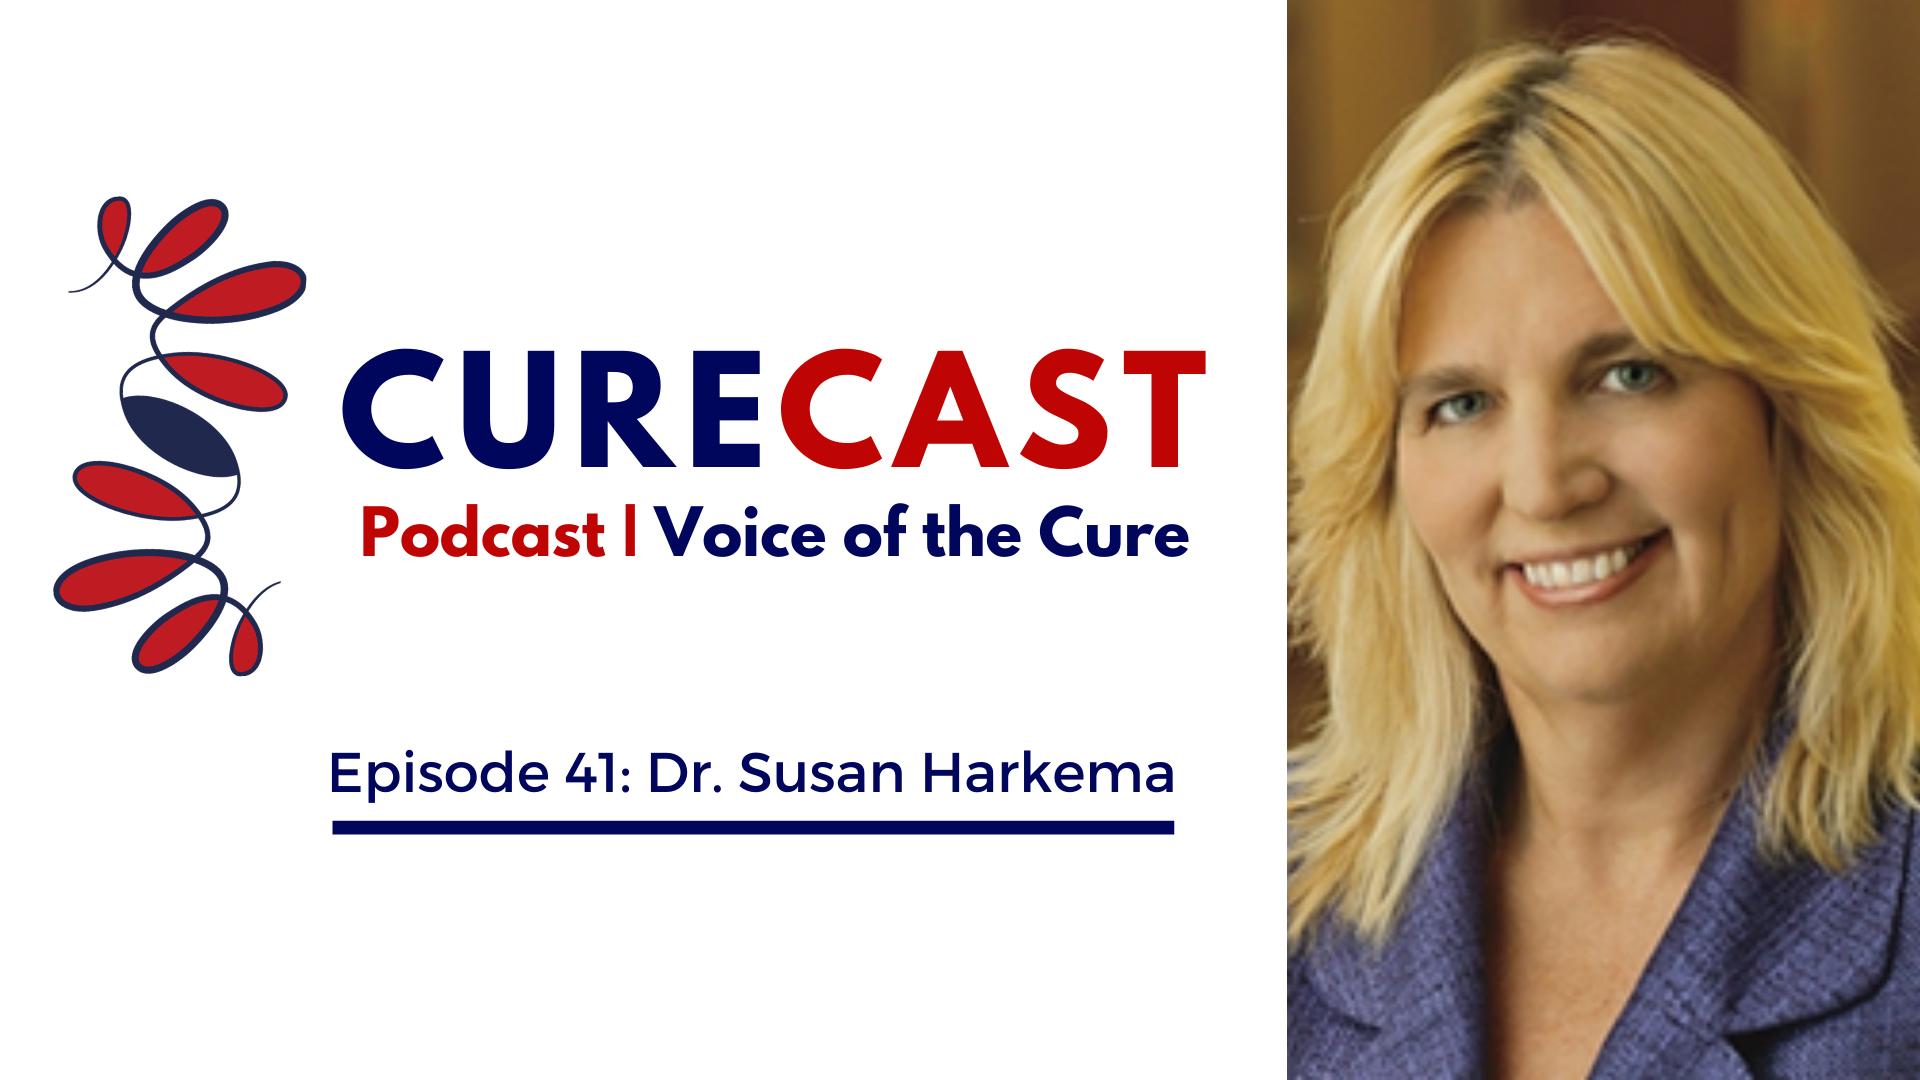 CureCast Episode 41: Dr. Susan Harkema